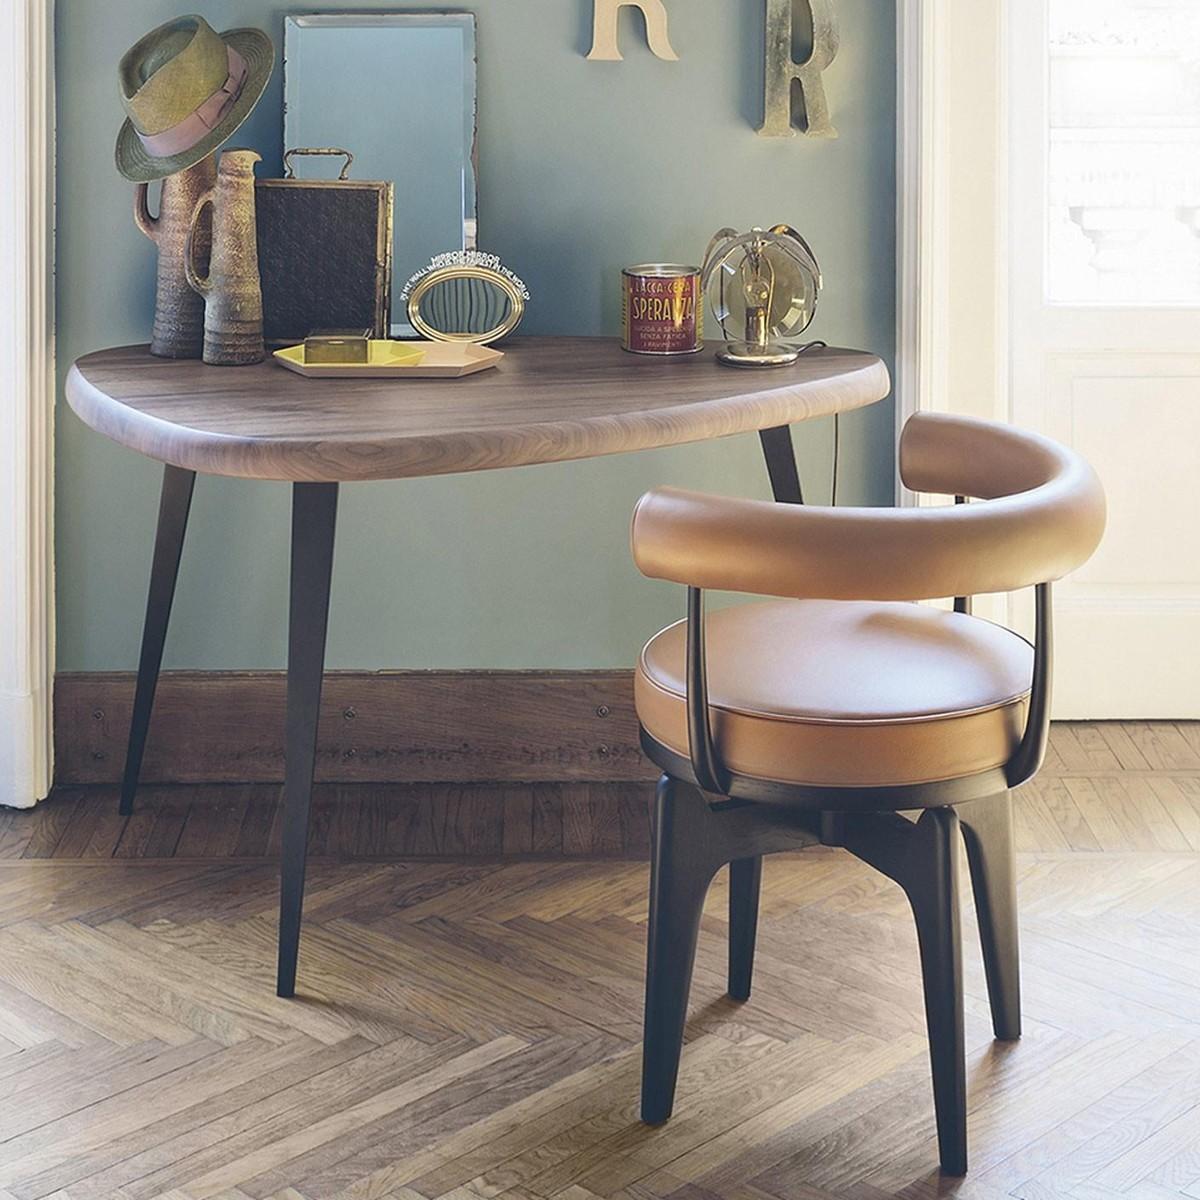 kaleido m ablage tablett hay. Black Bedroom Furniture Sets. Home Design Ideas